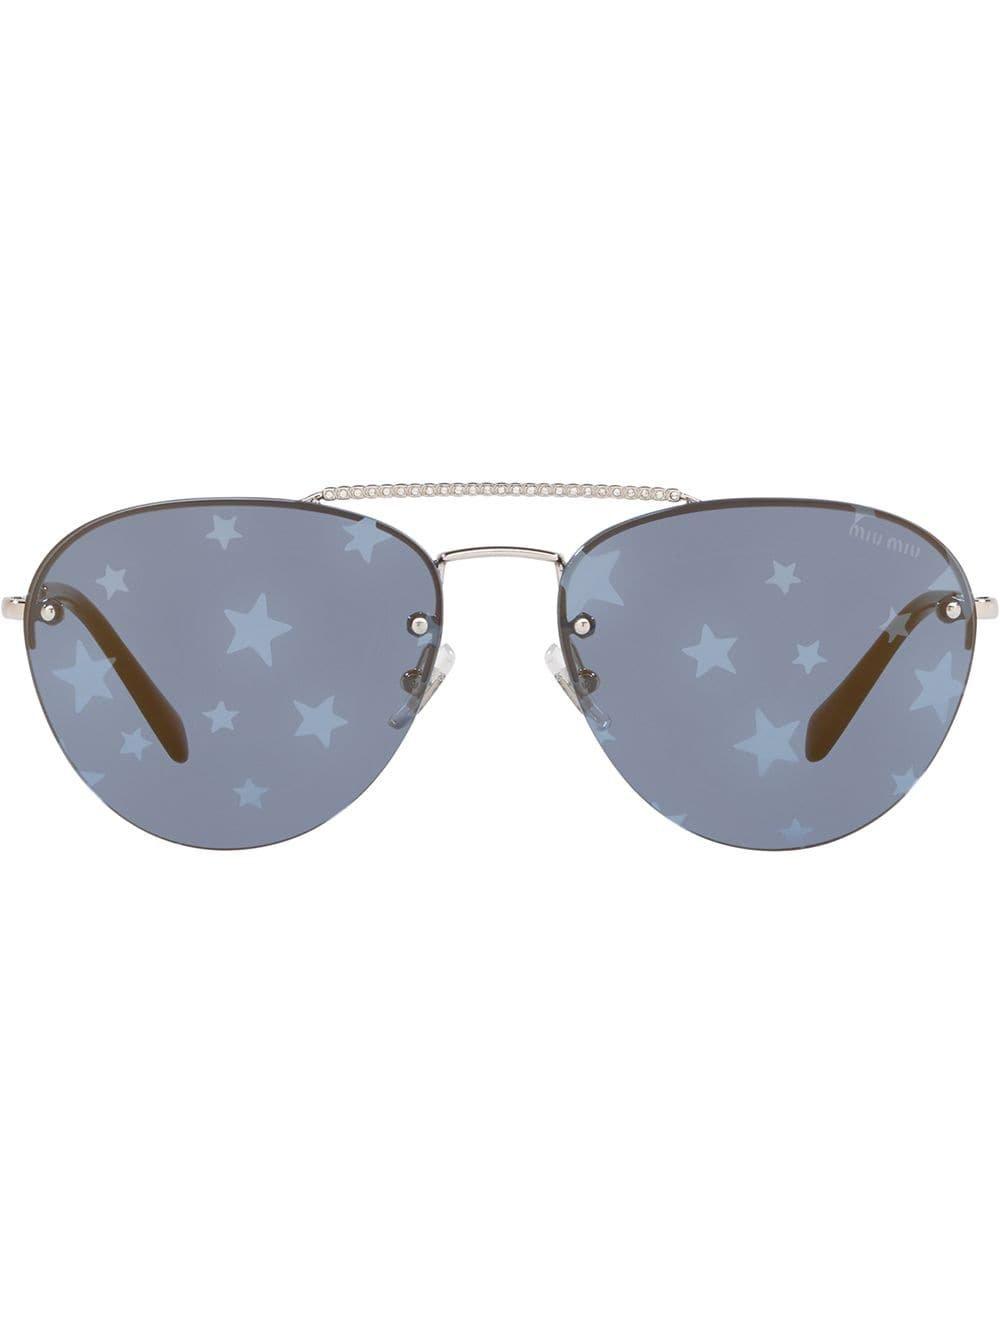 Miu Miu Eyewear Miu Miu Noir Sunglasses - Farfetch